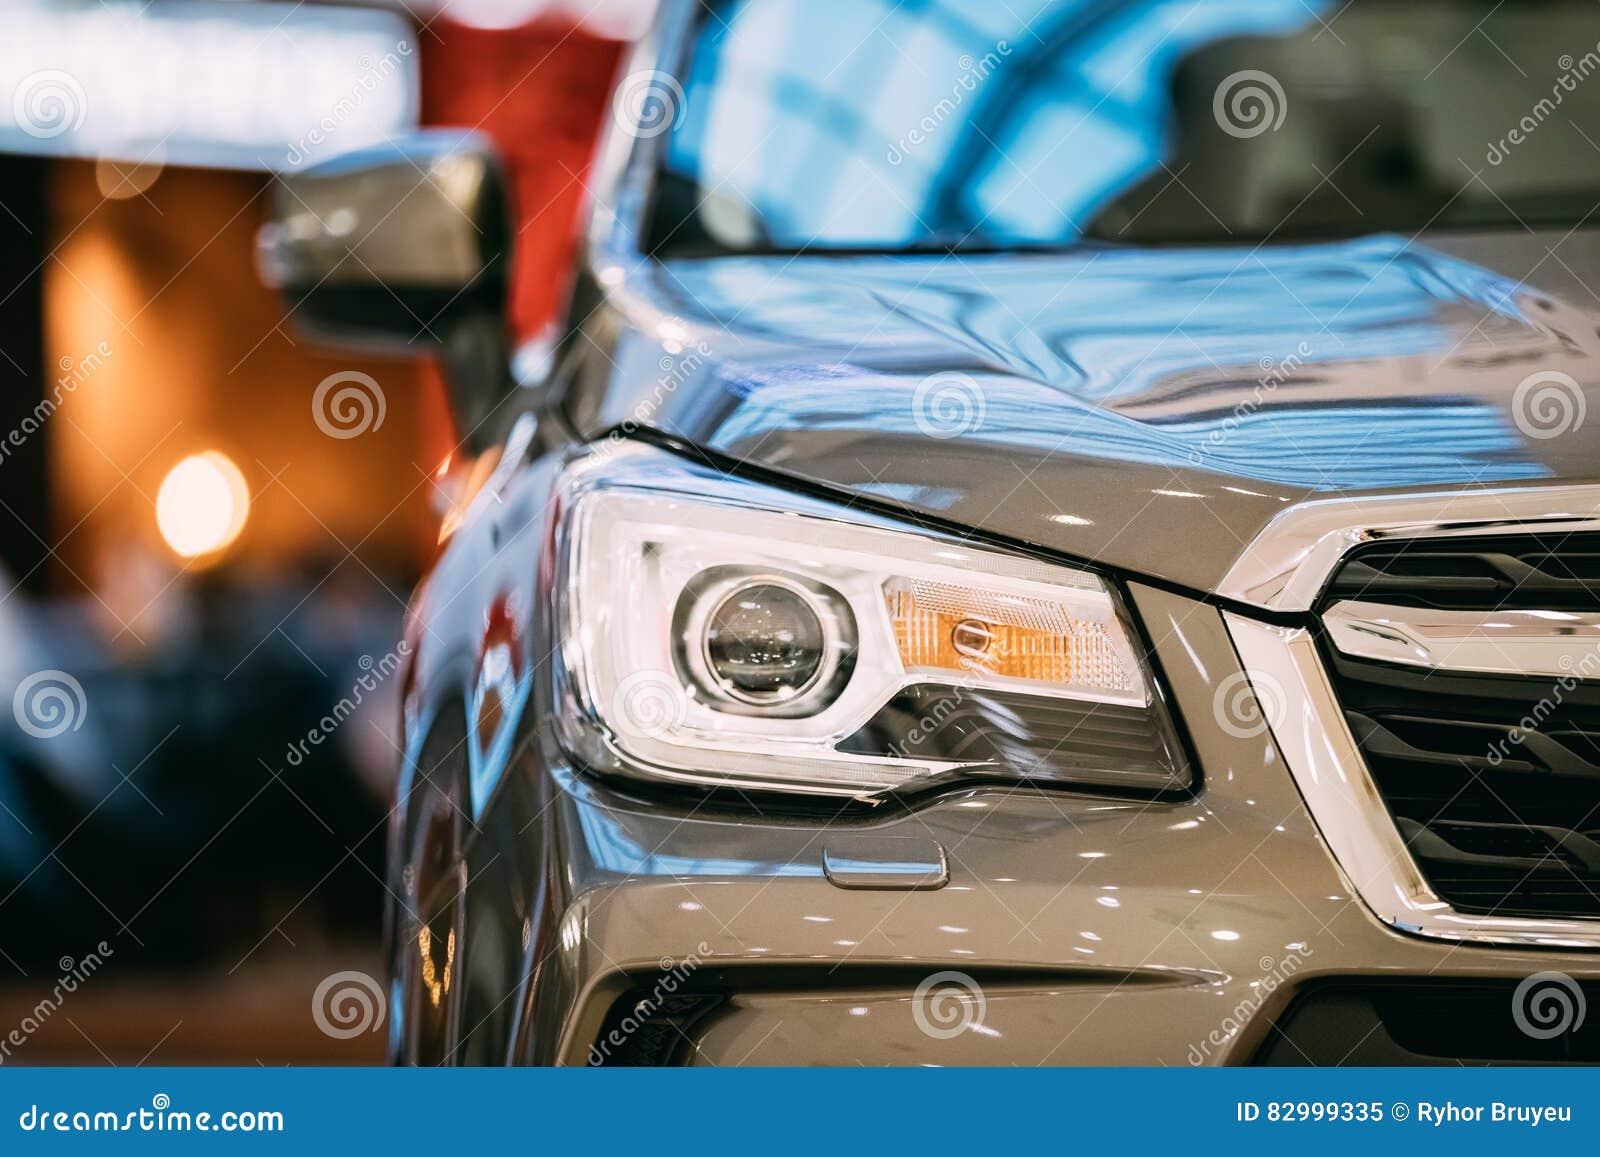 car headlight or headlamp royalty free stock image 83575720. Black Bedroom Furniture Sets. Home Design Ideas